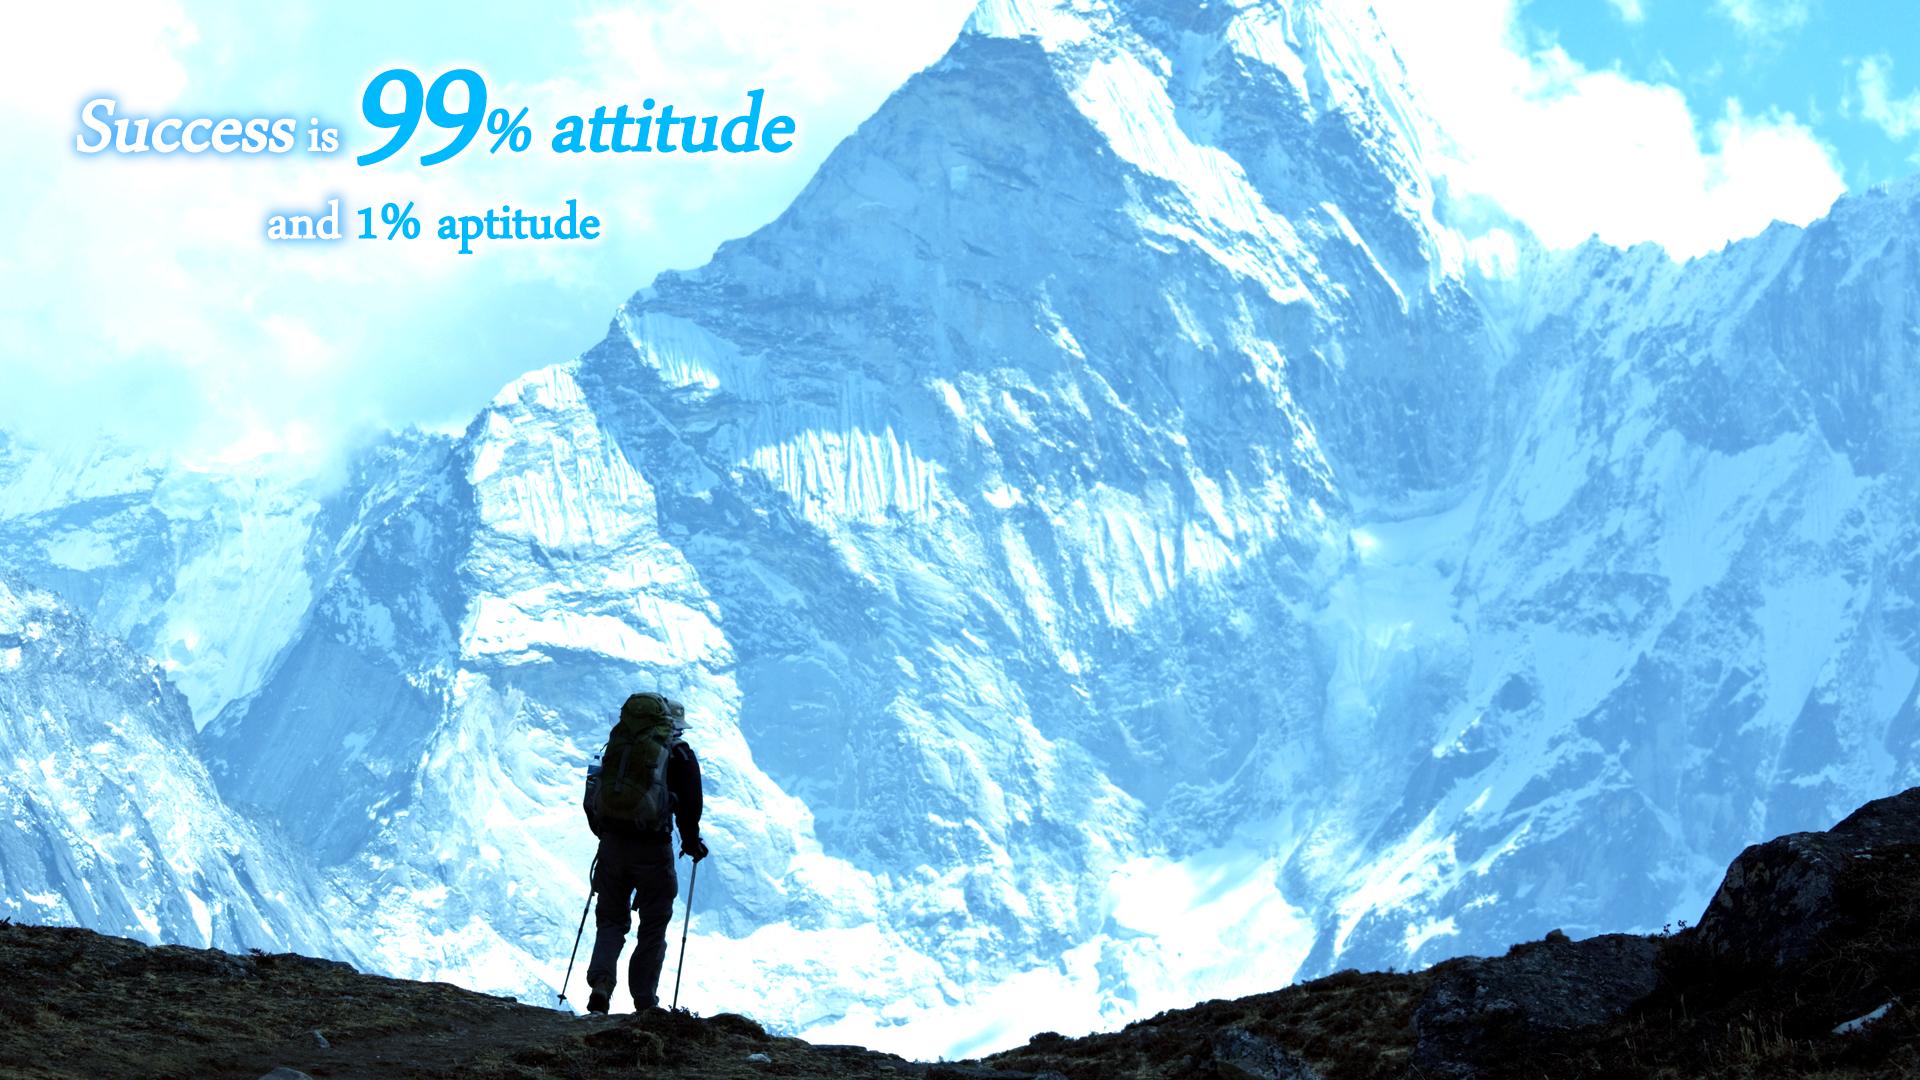 Himalaya Hd Wallpaper 15 Beautiful Inspirational Wallpapers For Your Desktop